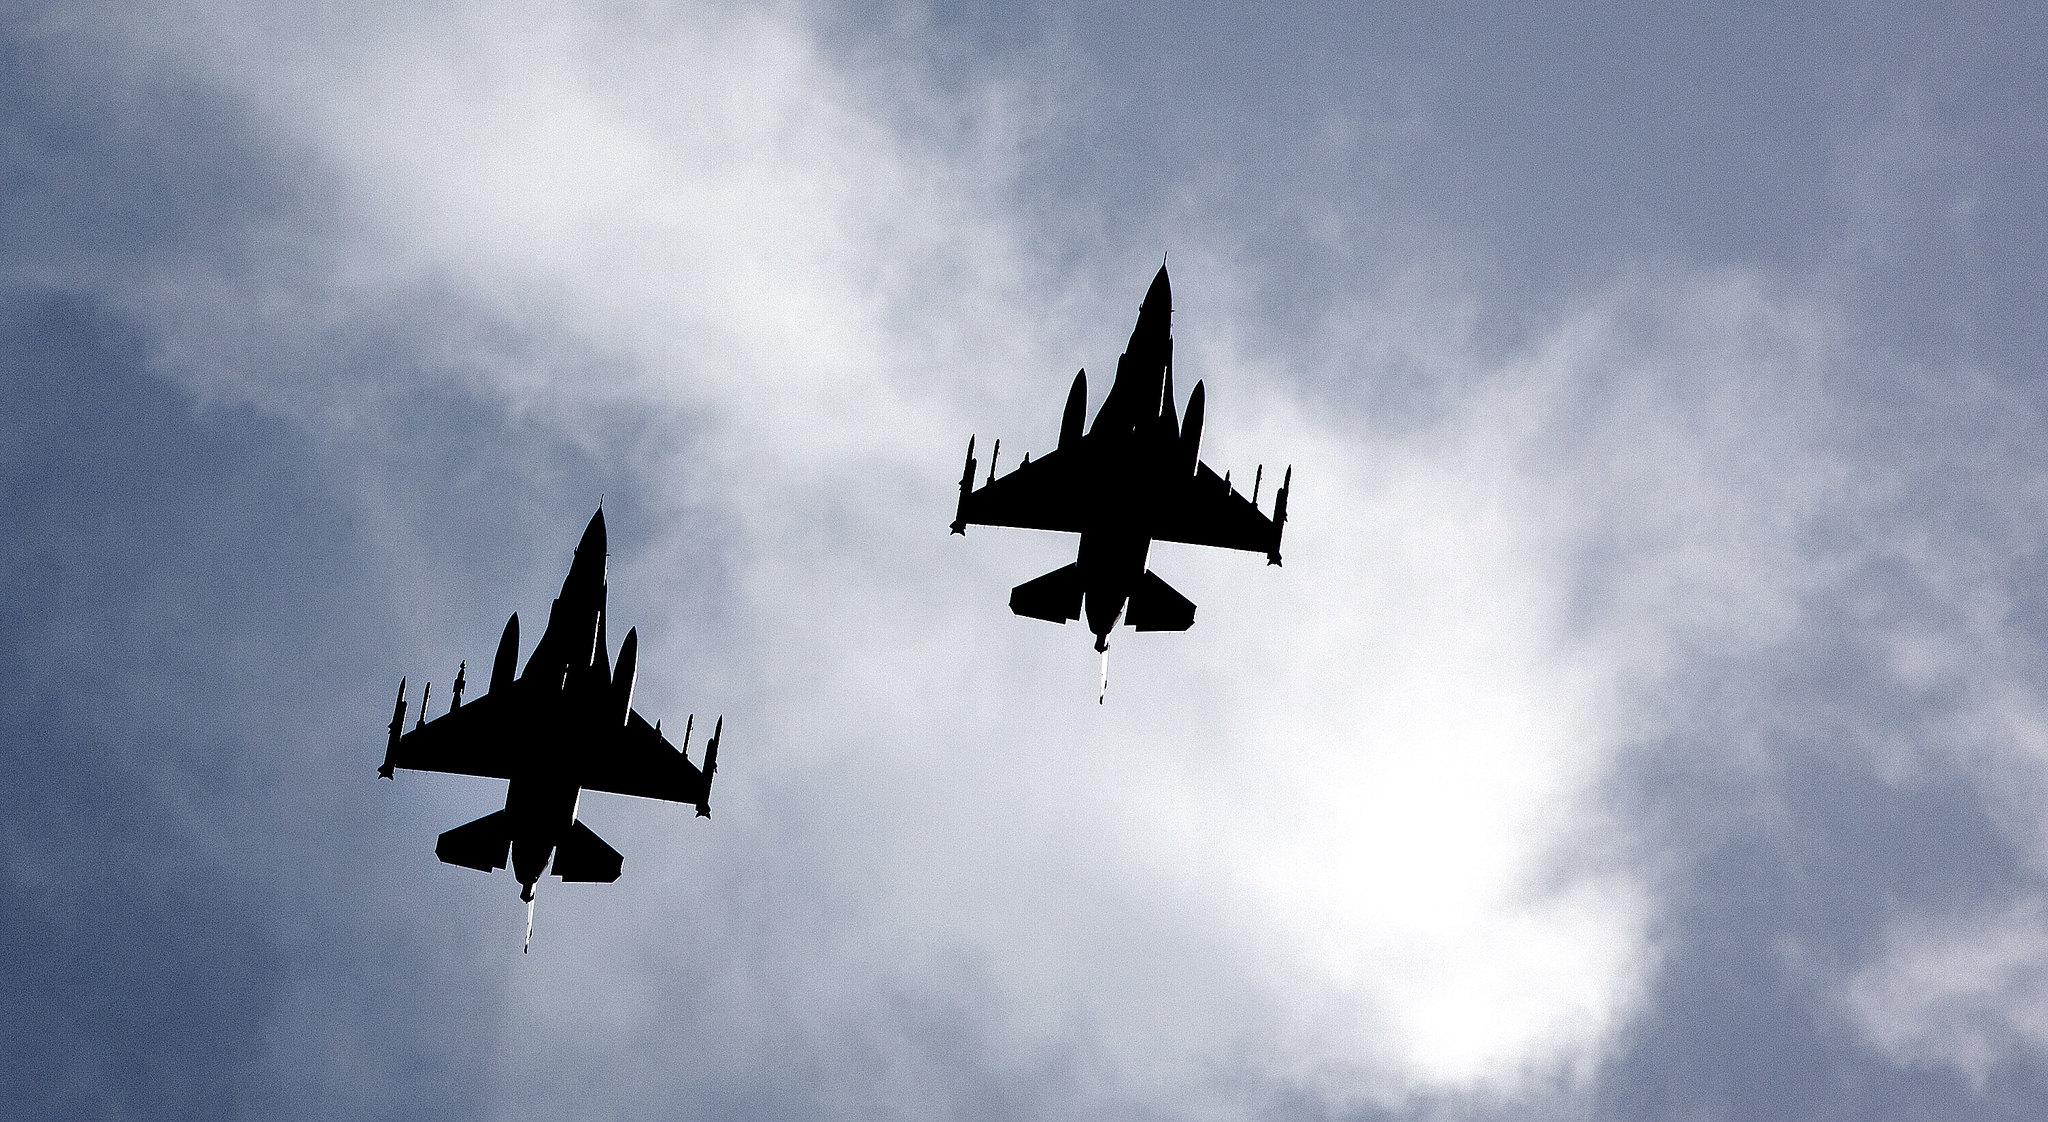 Two Norwegian F-16's Libya 2011